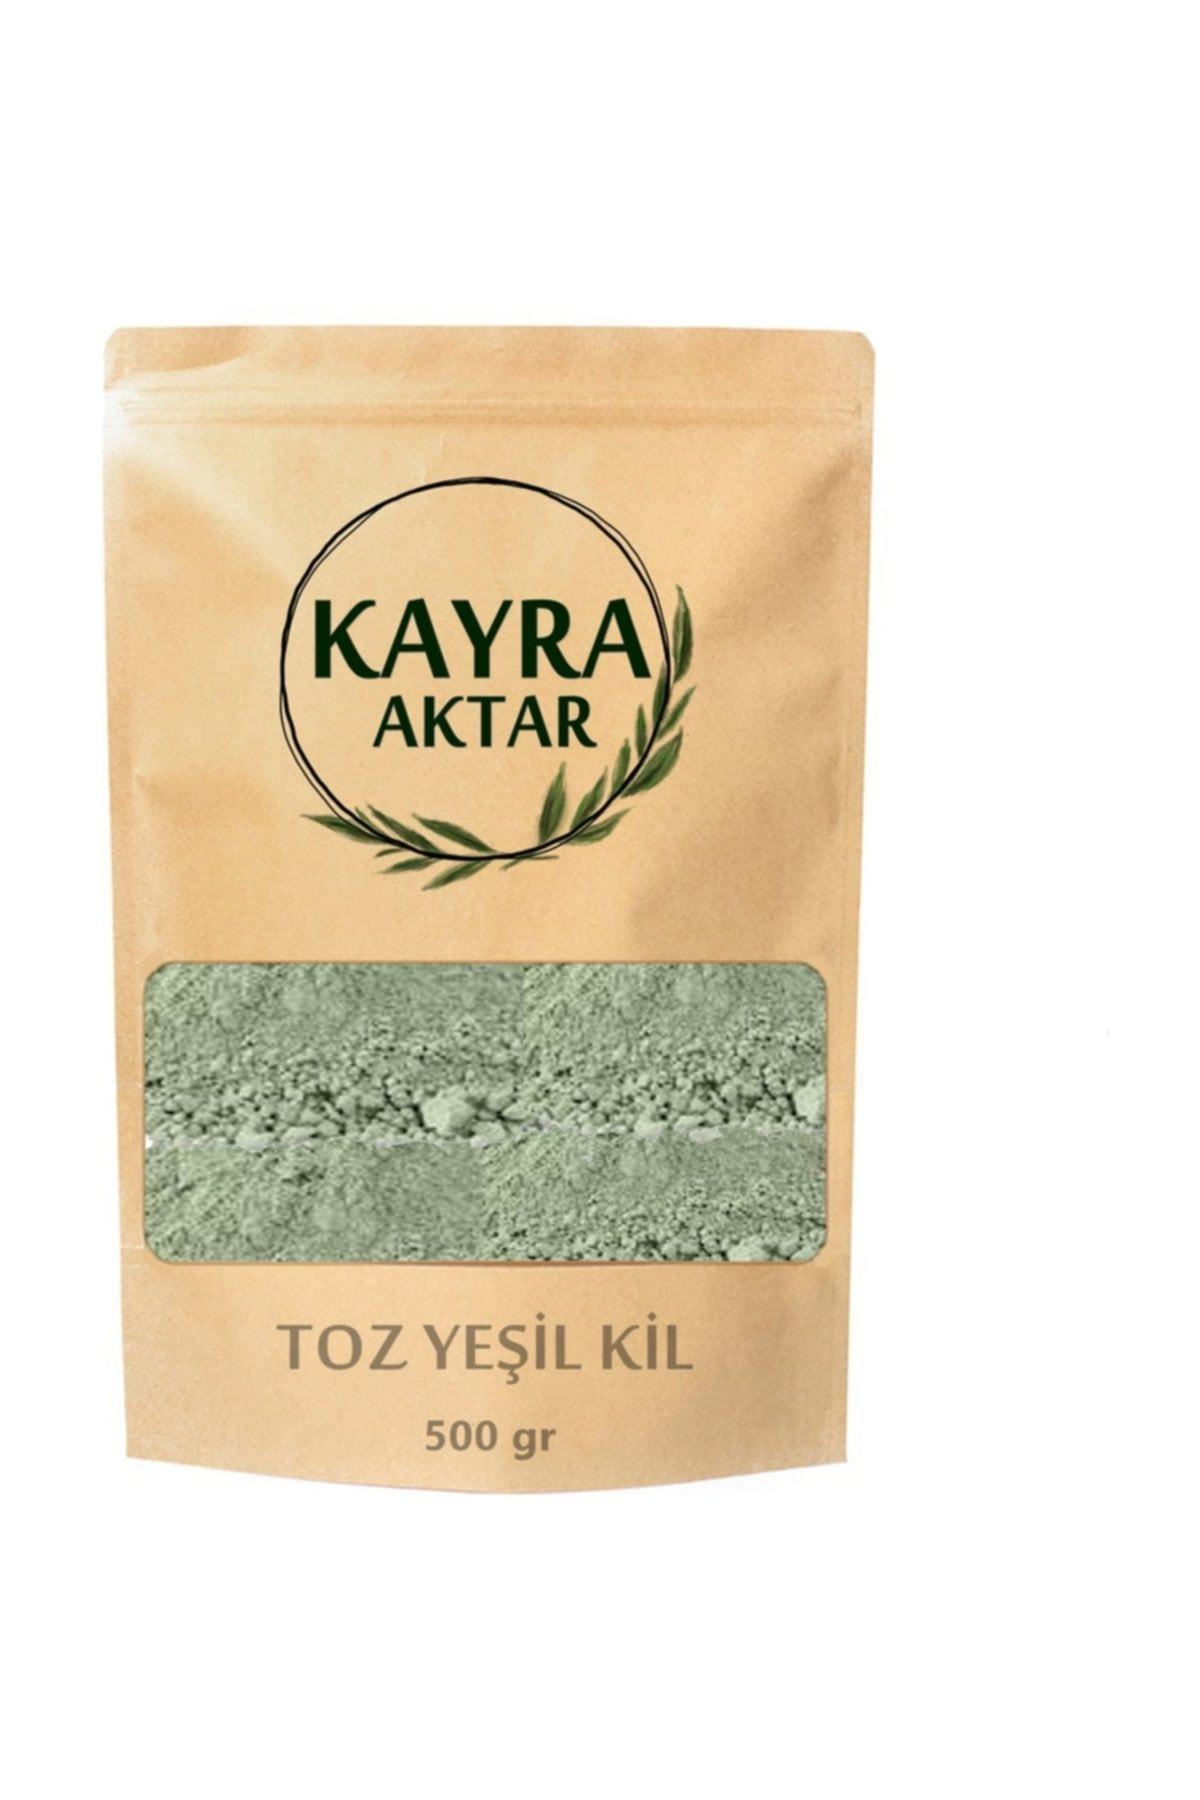 Kayra AKTAR Toz Yeşil Kil 500 gr 1